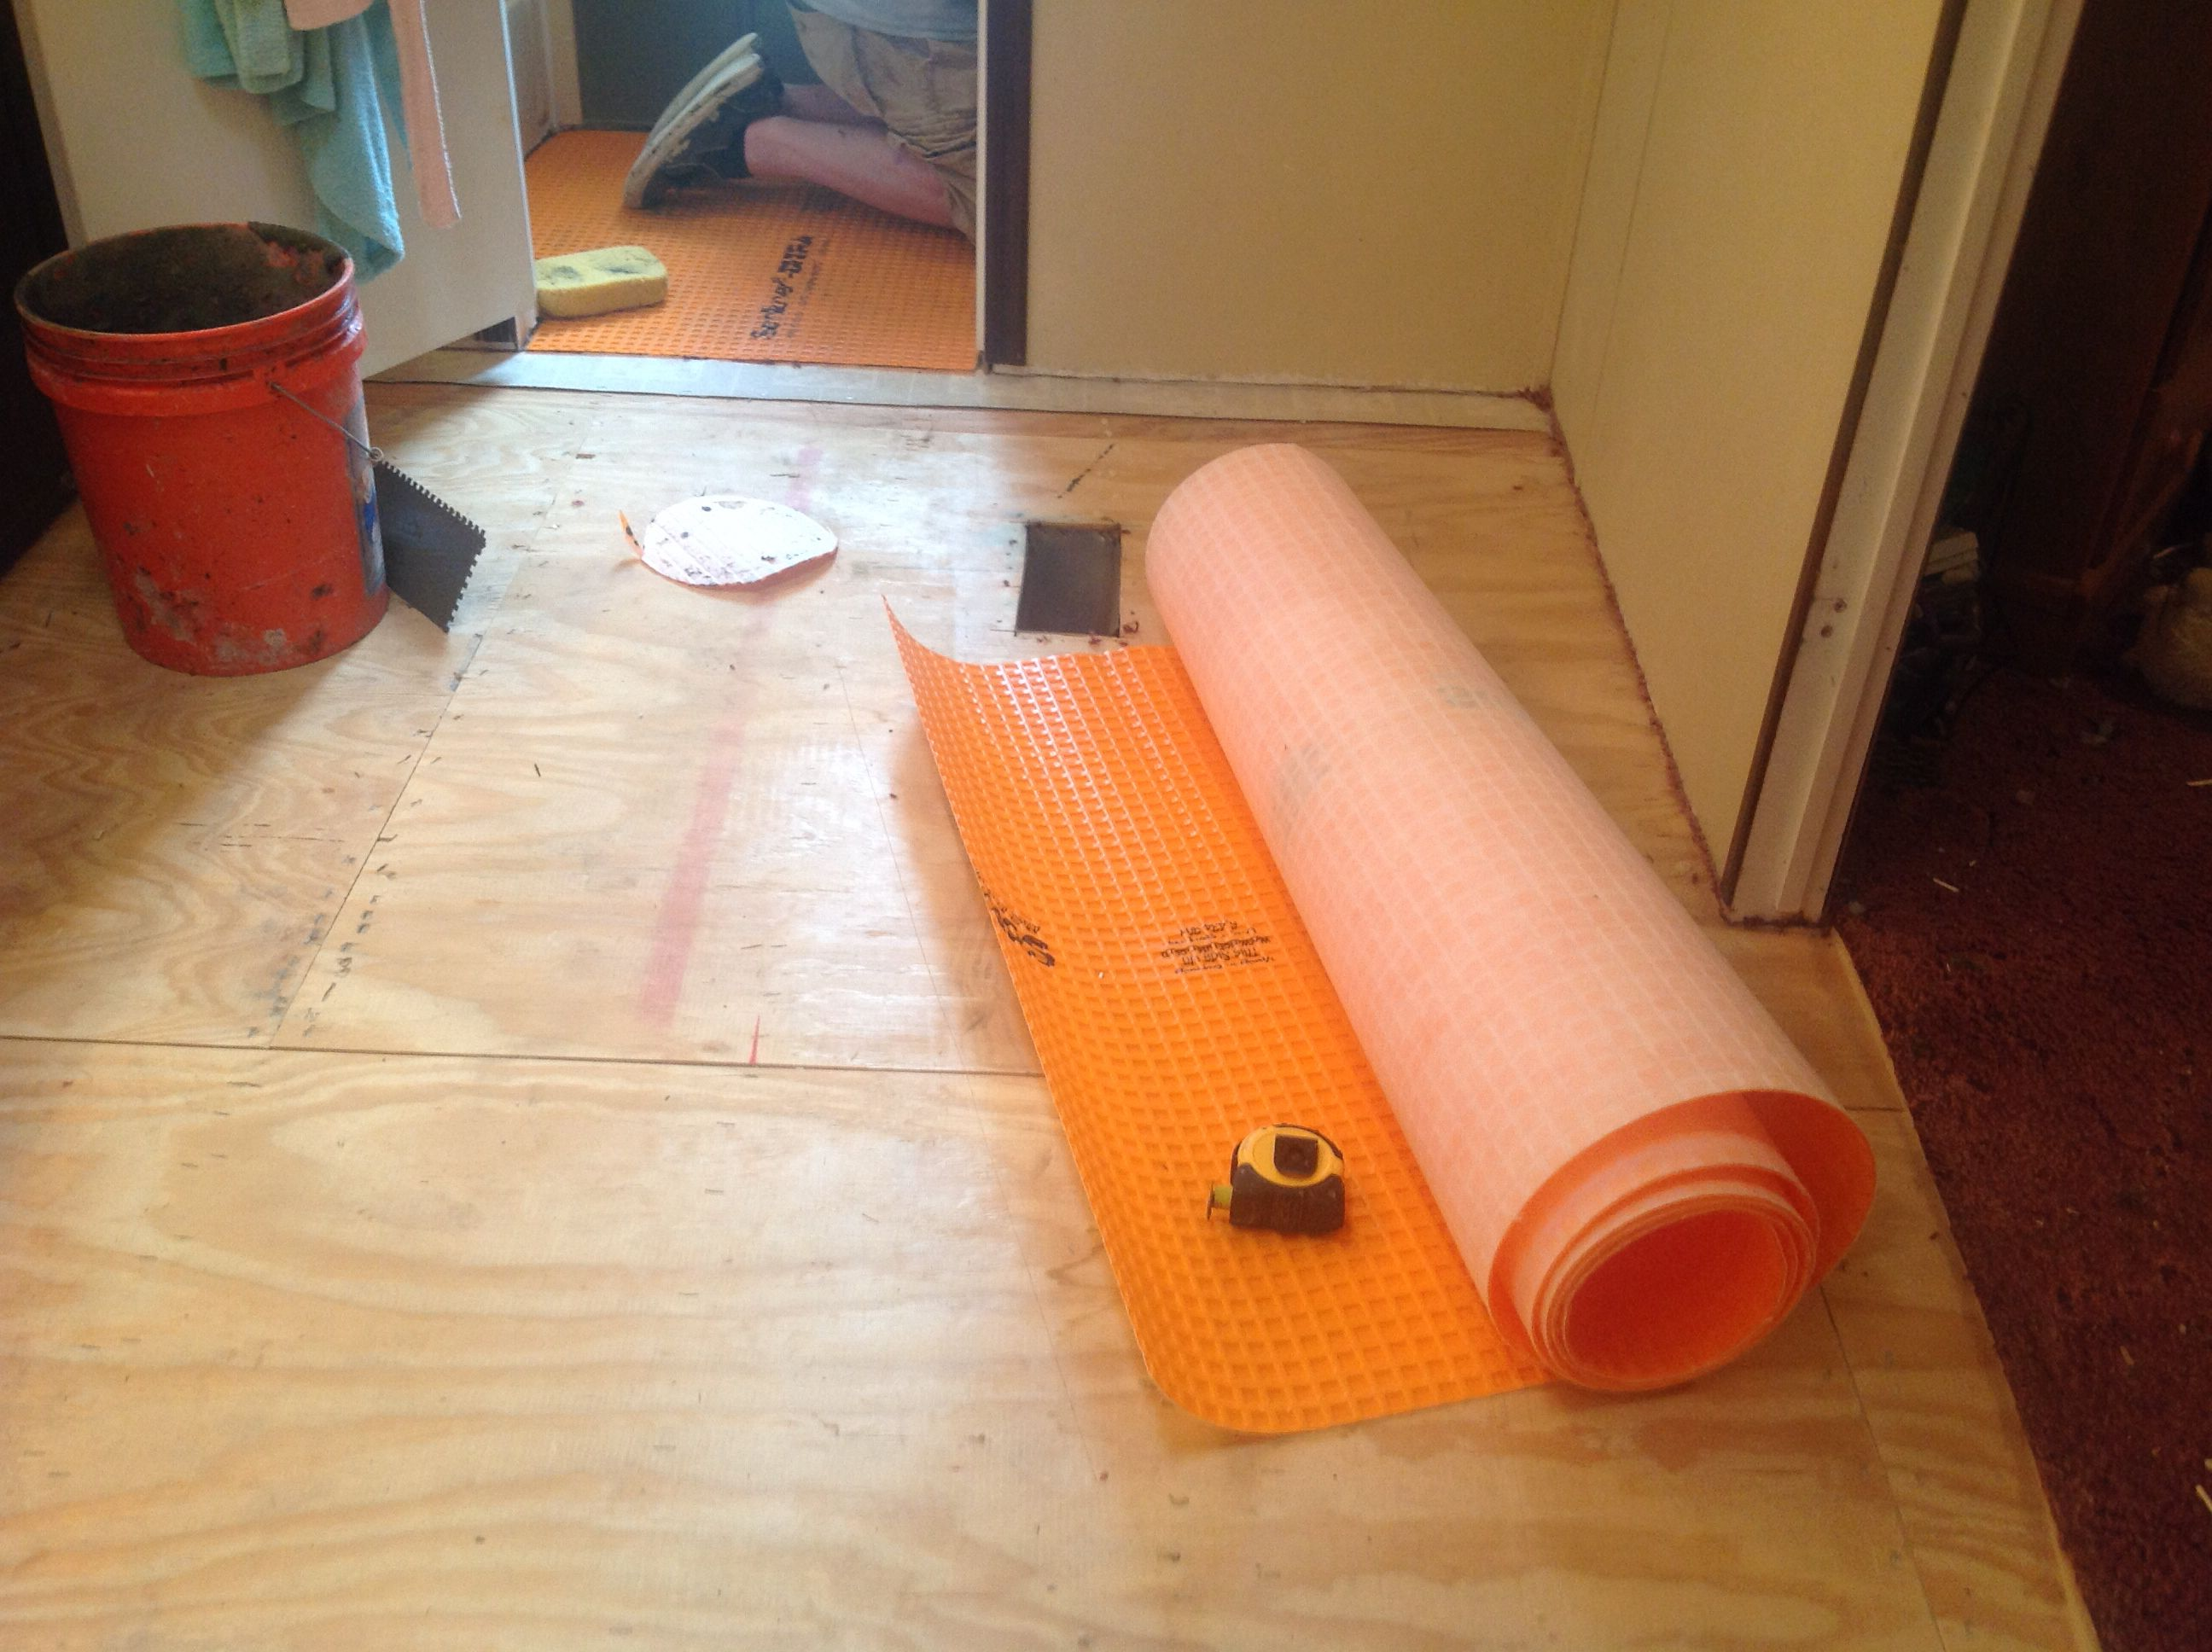 schluter-DITRA underlayment before starting TravertineStone floor in bathroom